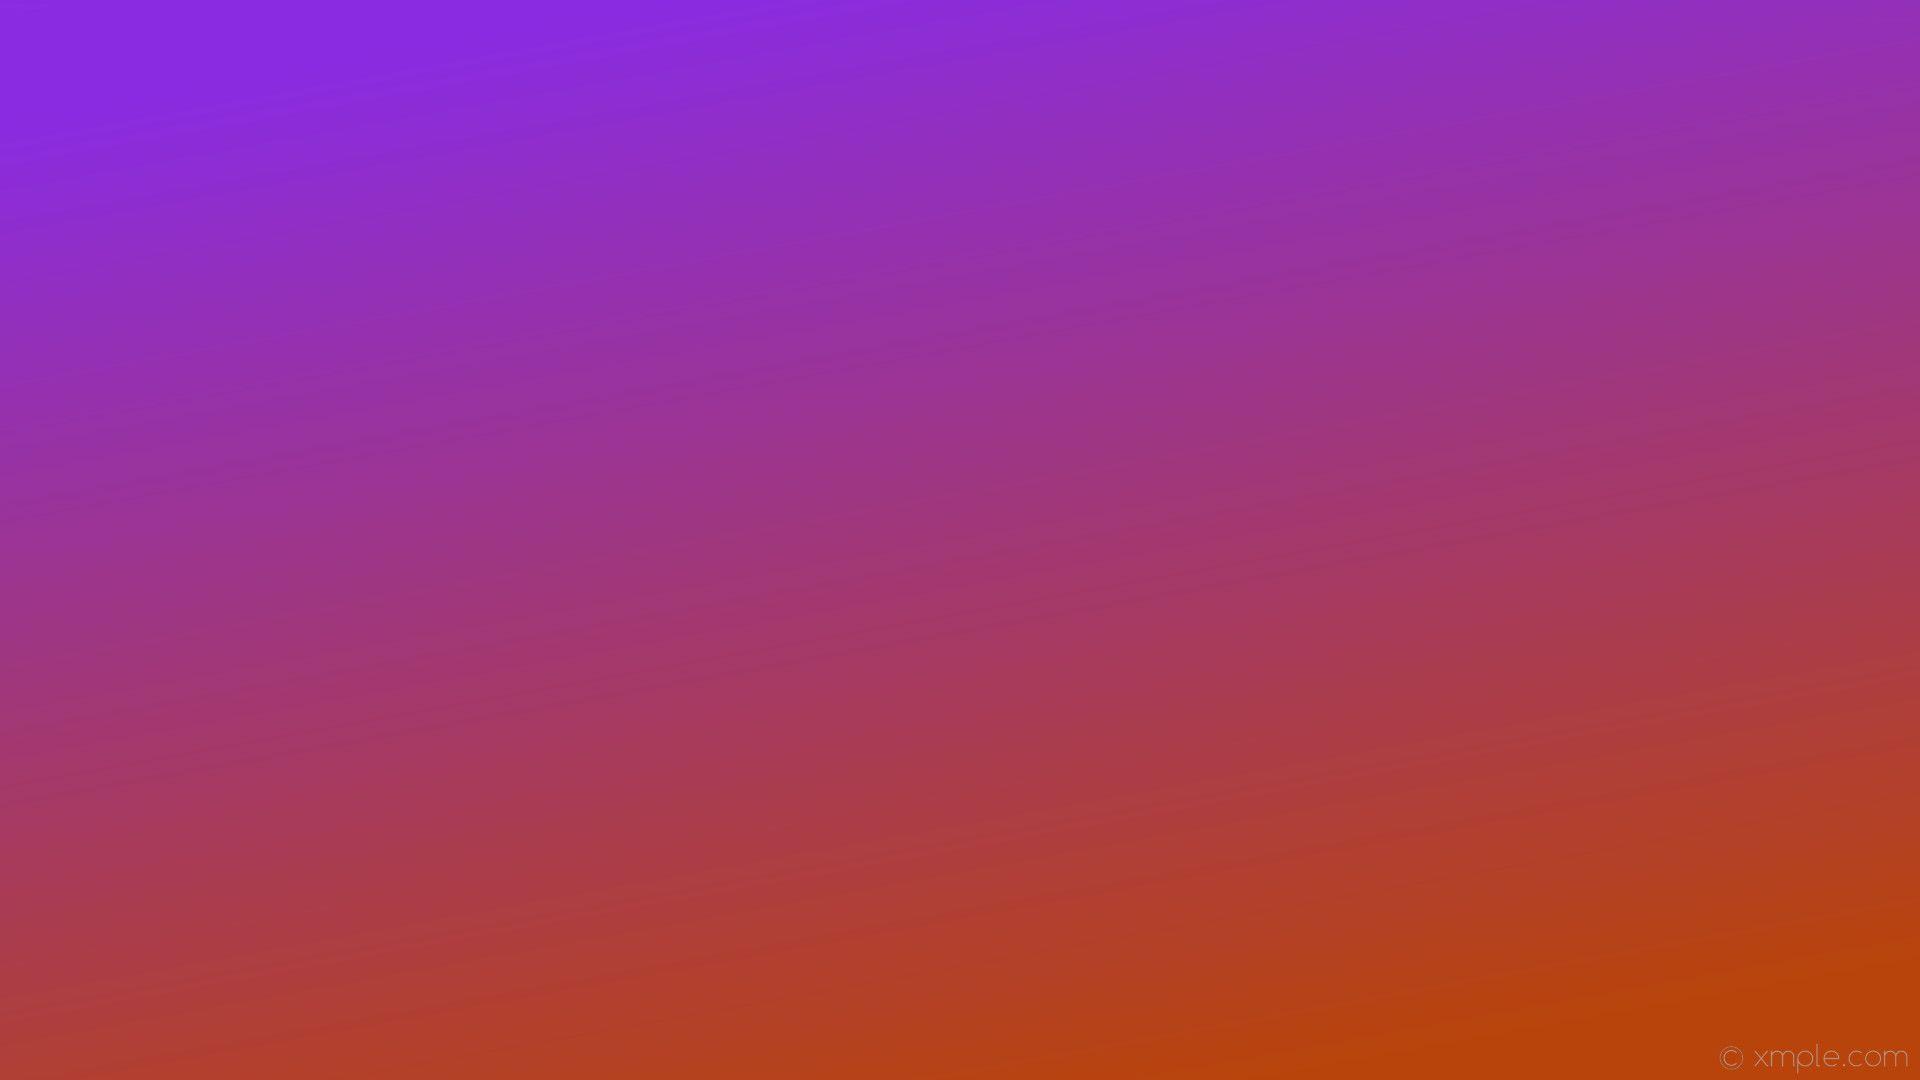 Purple And Orange Wallpapers Top Free Purple And Orange